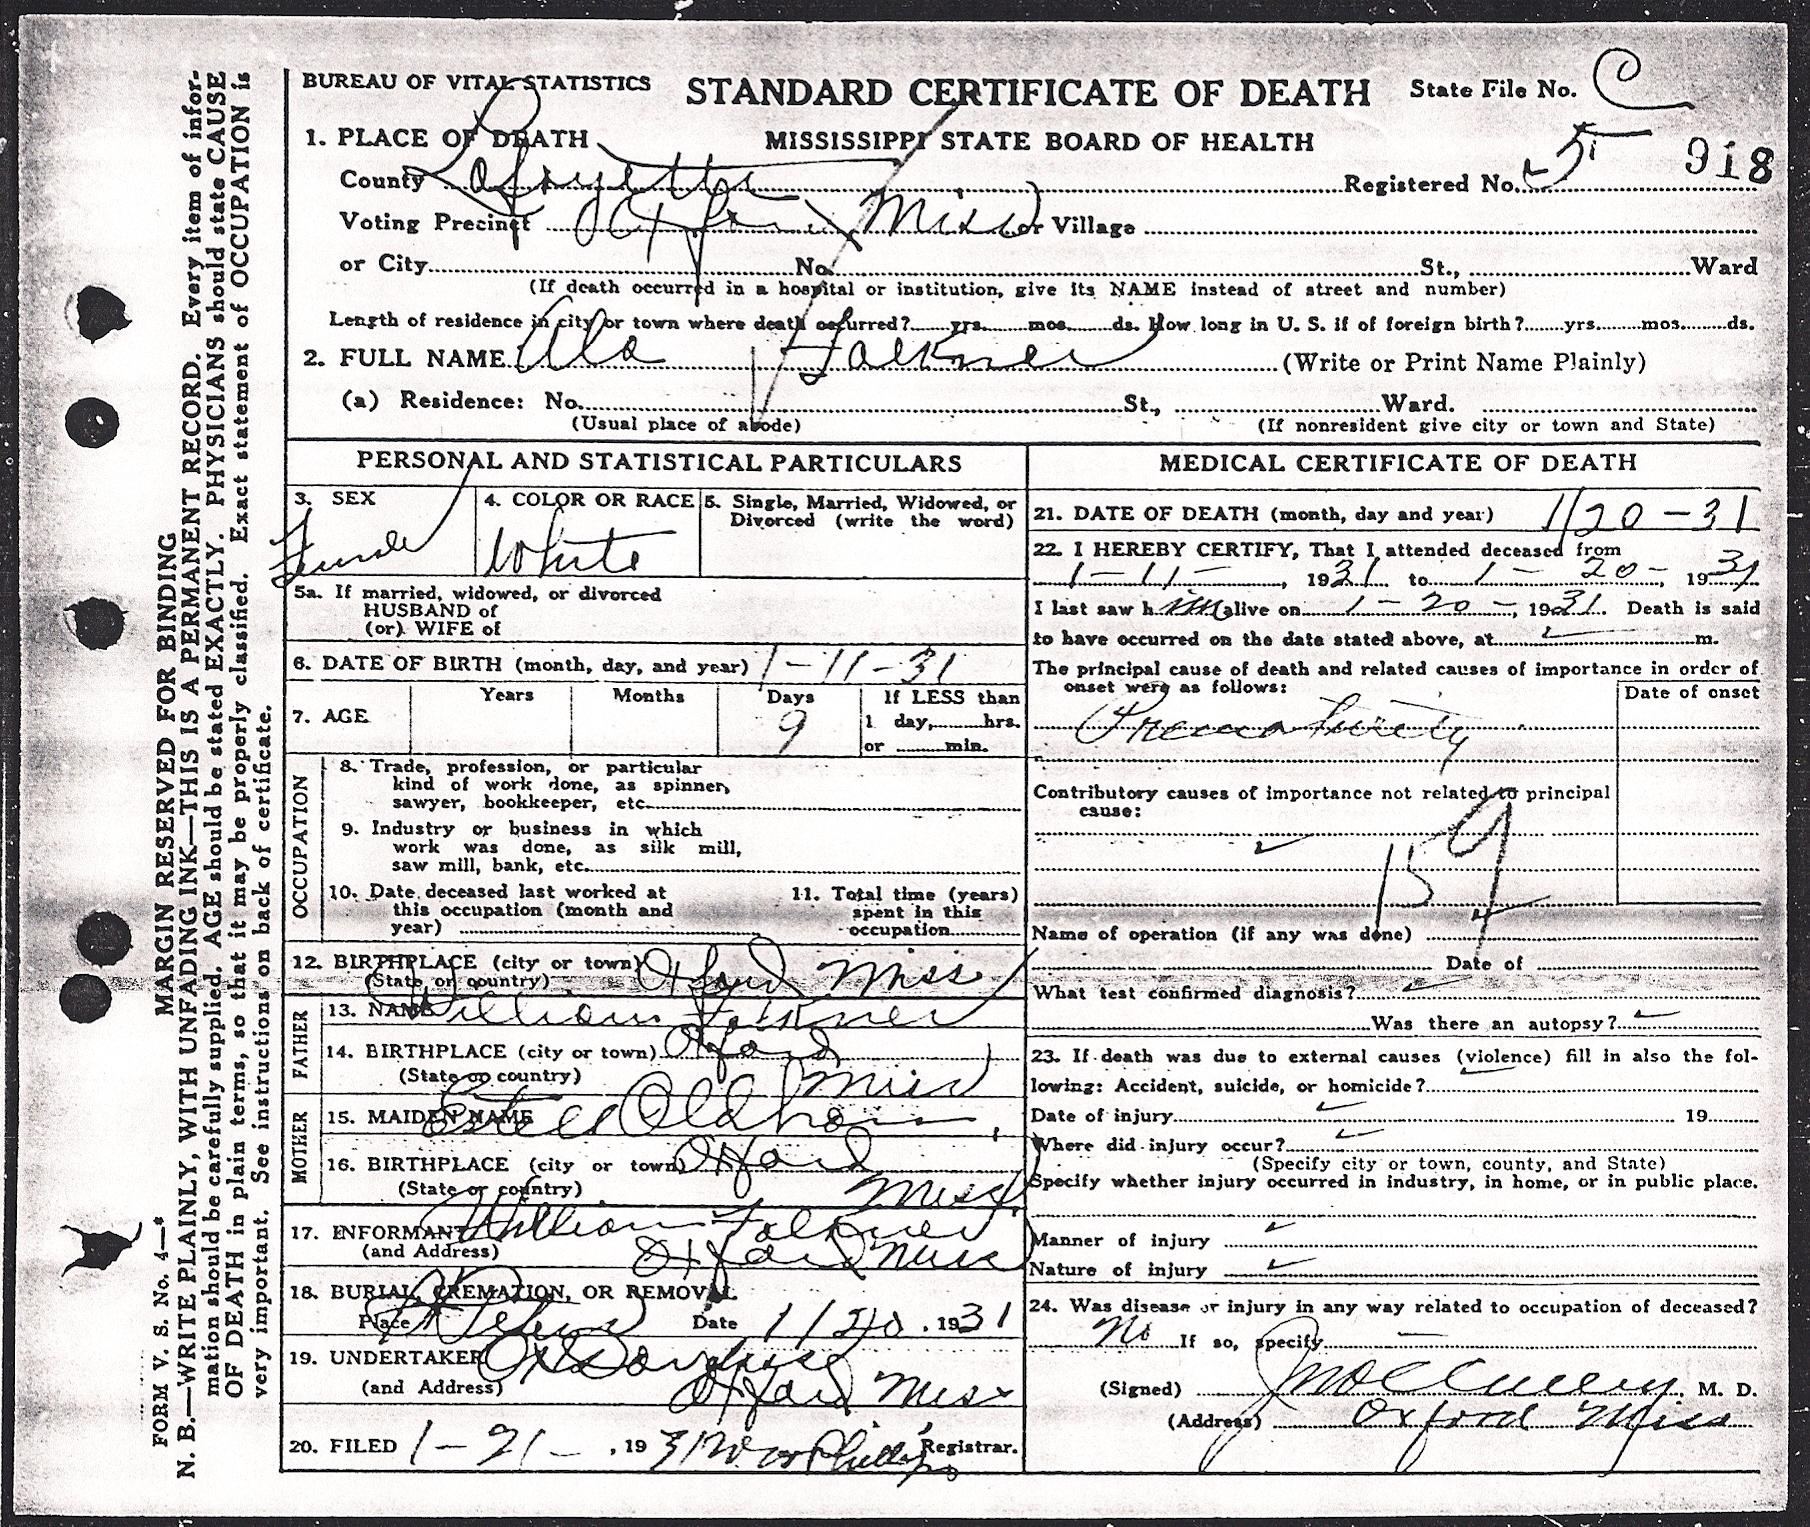 Alabama faulkner 1931 1931 find a grave memorial 1931 01 20 alabama faulkner death certificate positive microfilm image aiddatafo Images